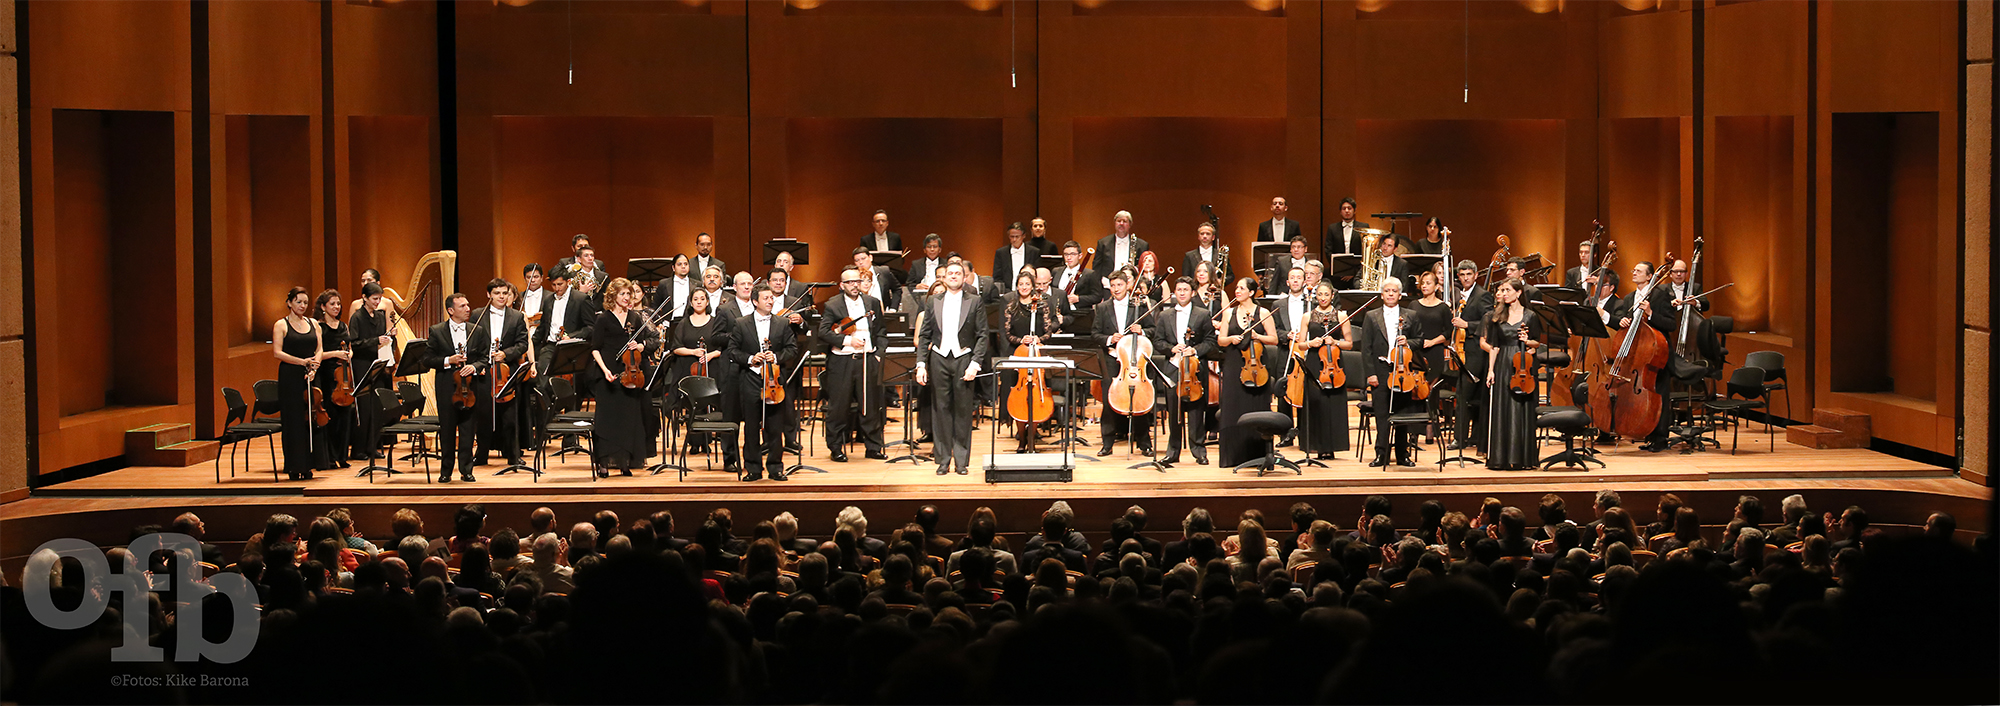 Orquesta Filarmónica de Bogotá - Felipe Aguirre